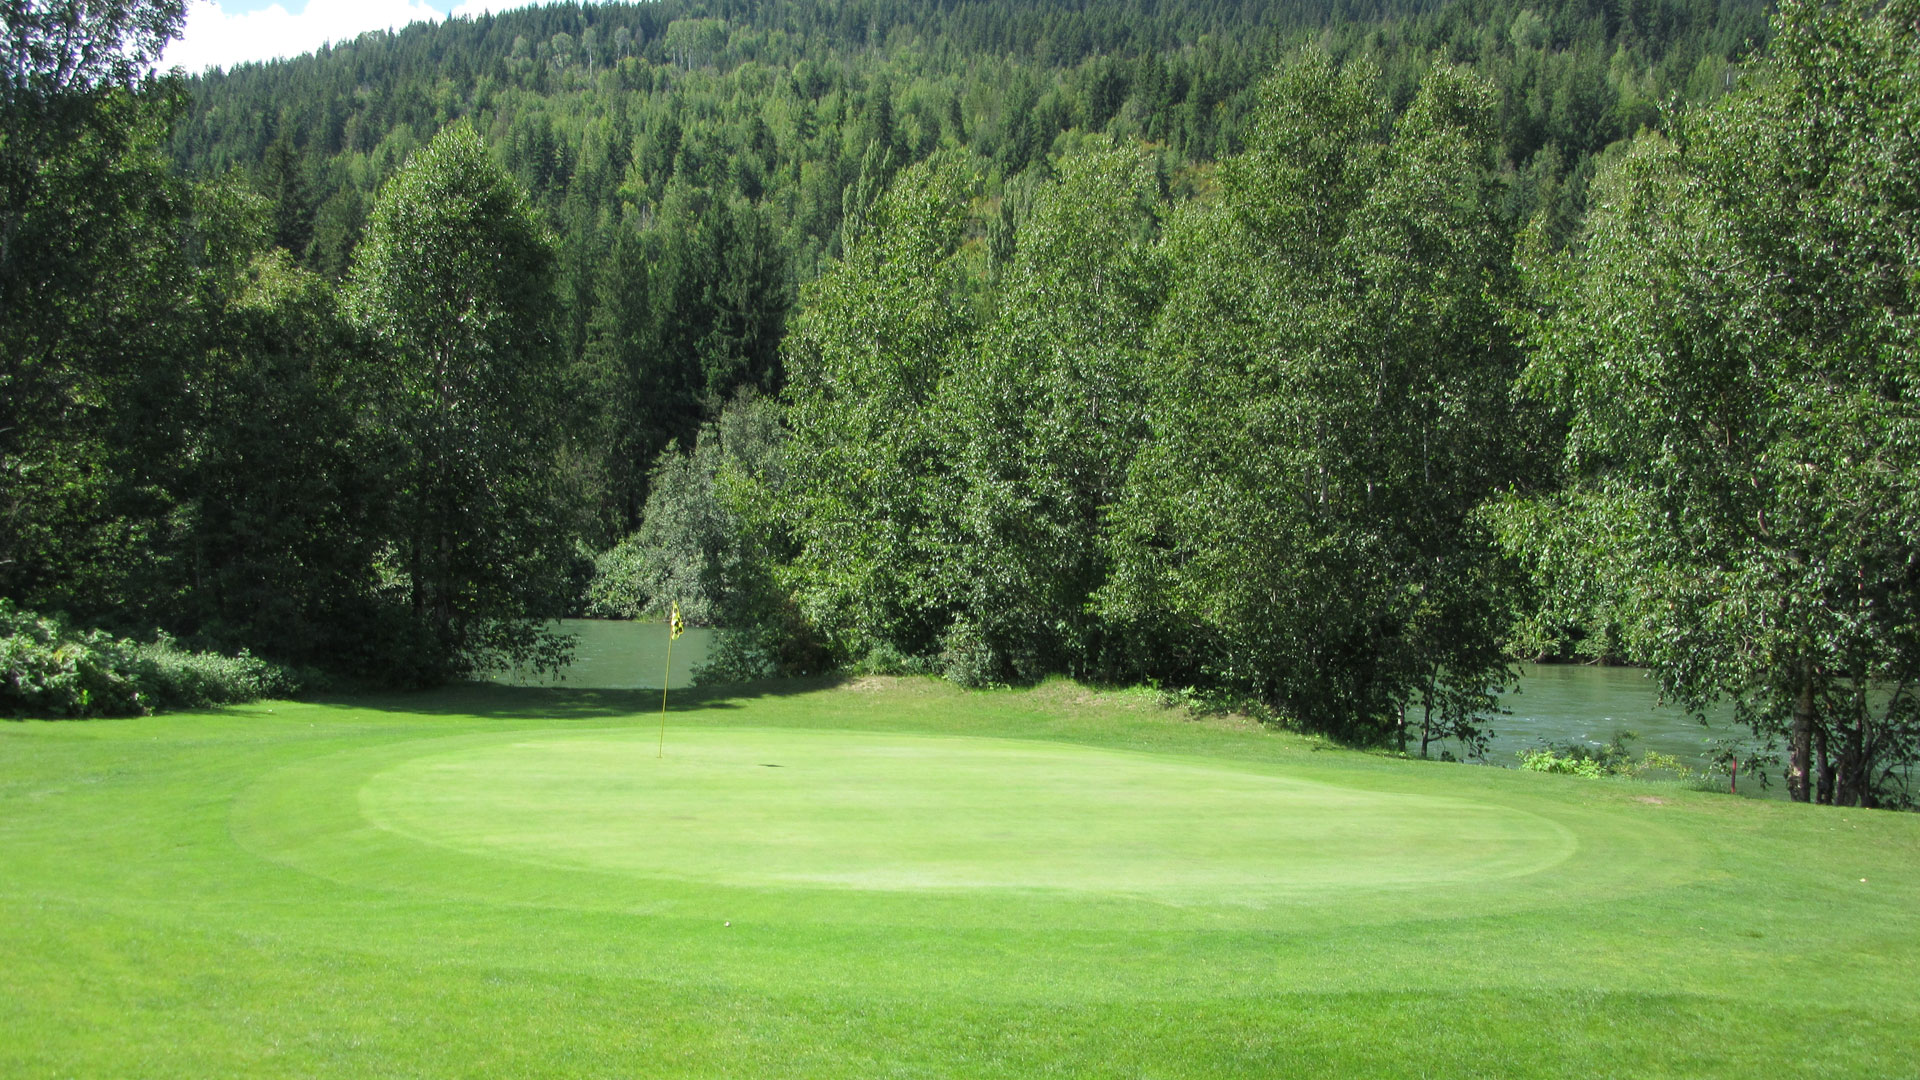 Eagle River Golf - Hole 4 Green